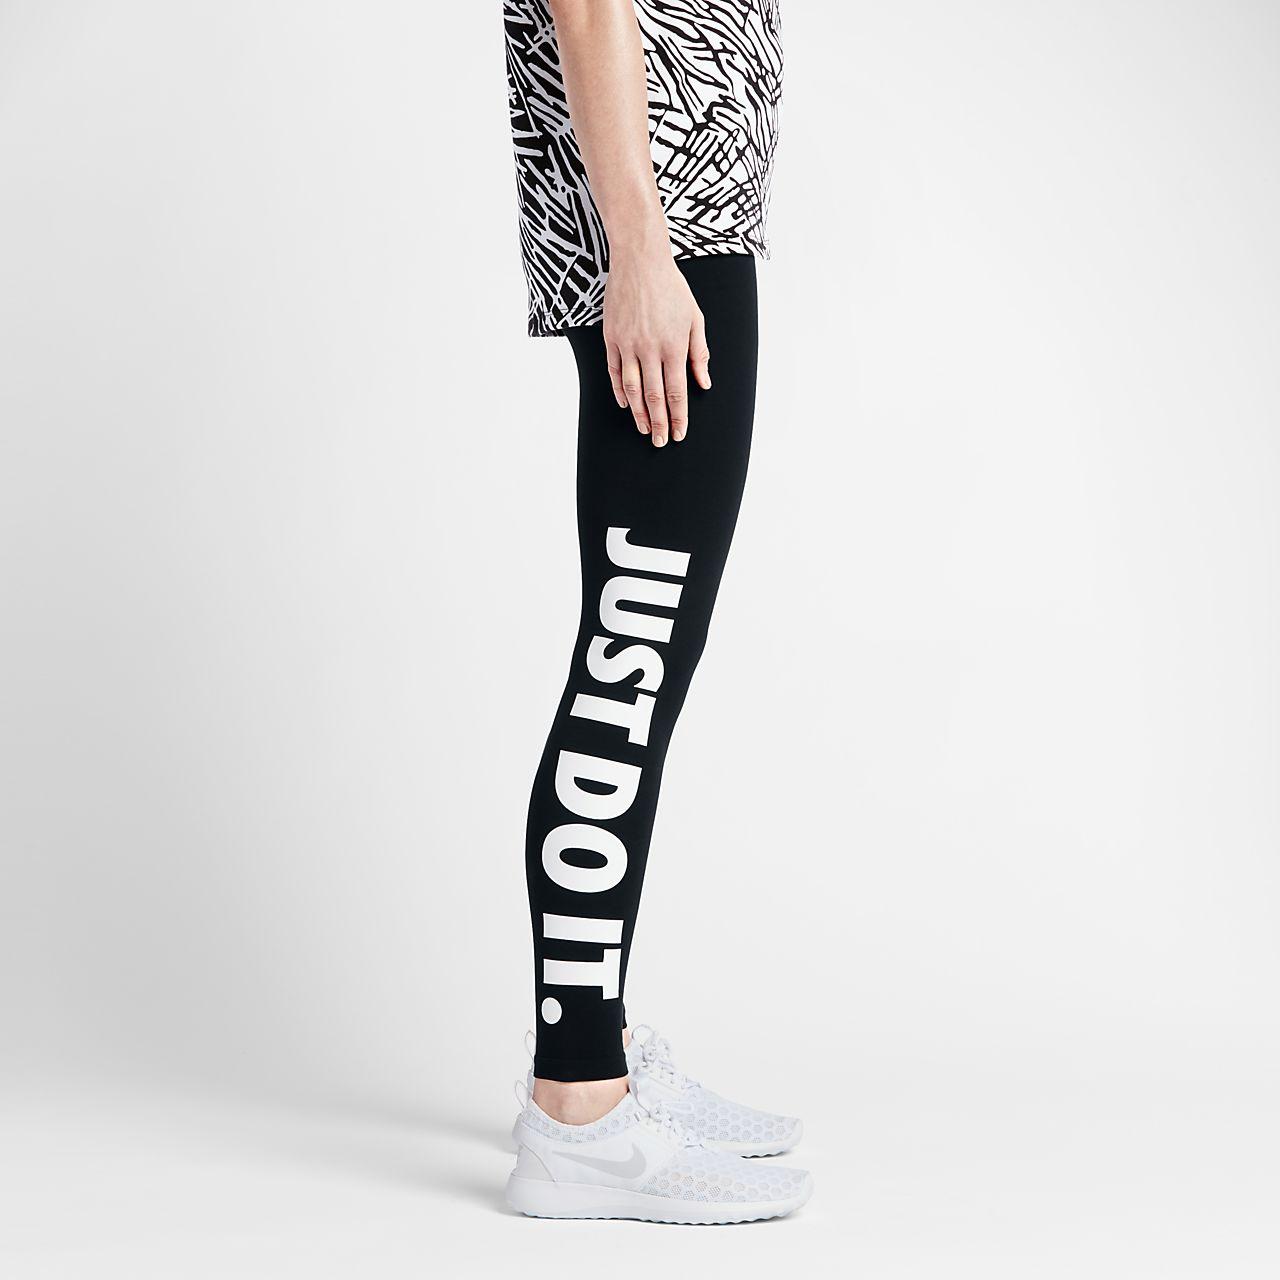 4865b10afc Nike Sportswear Leg-A-See Women's Leggings. Nike.com CA